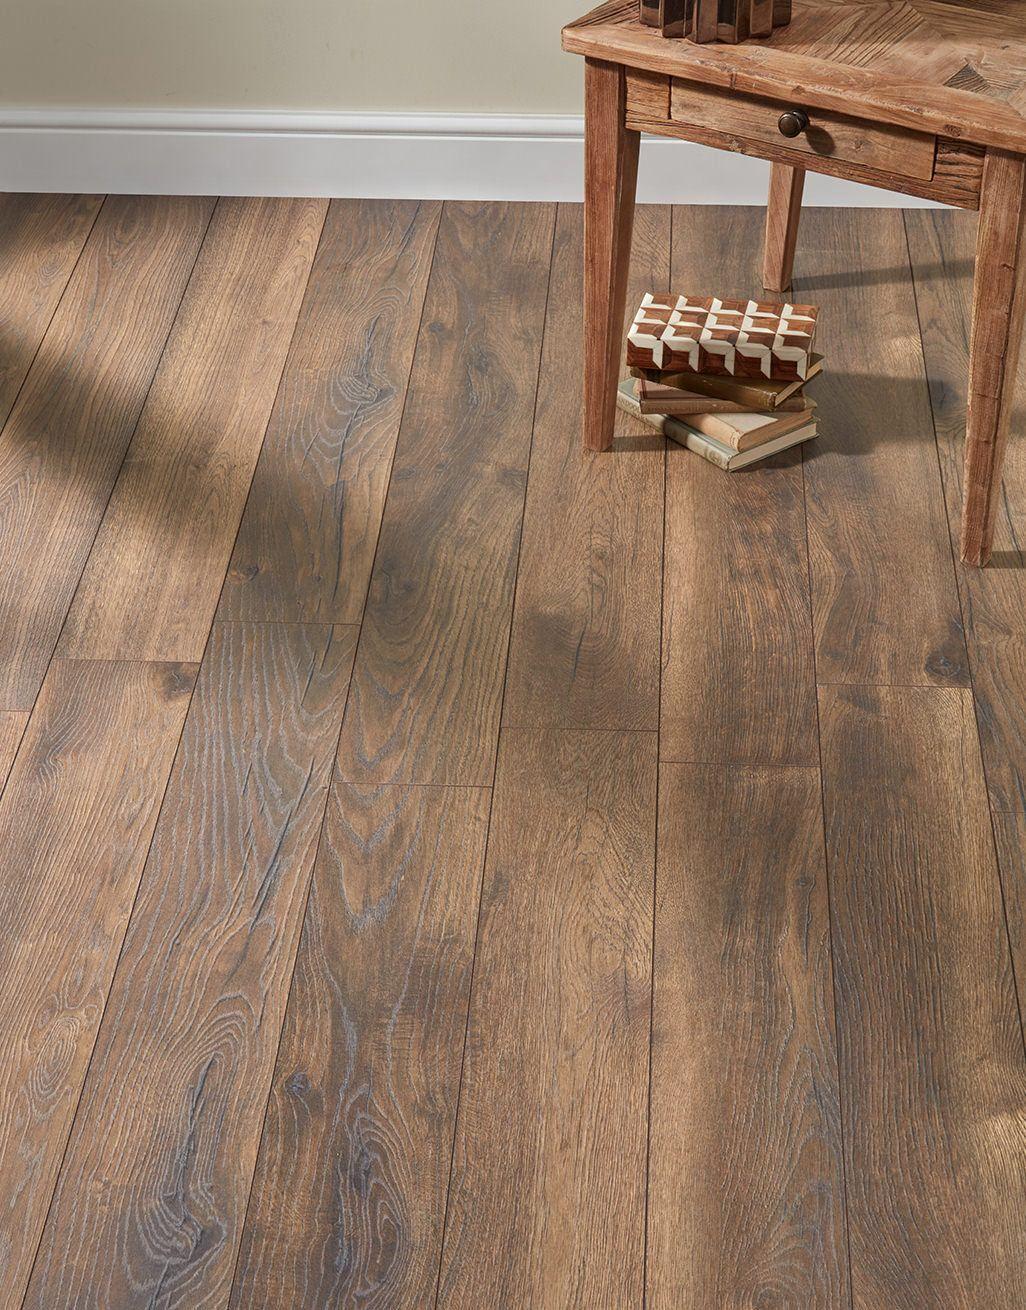 Dark Peterson Oak Laminate Flooring, Laminate Flooring Dark Brown